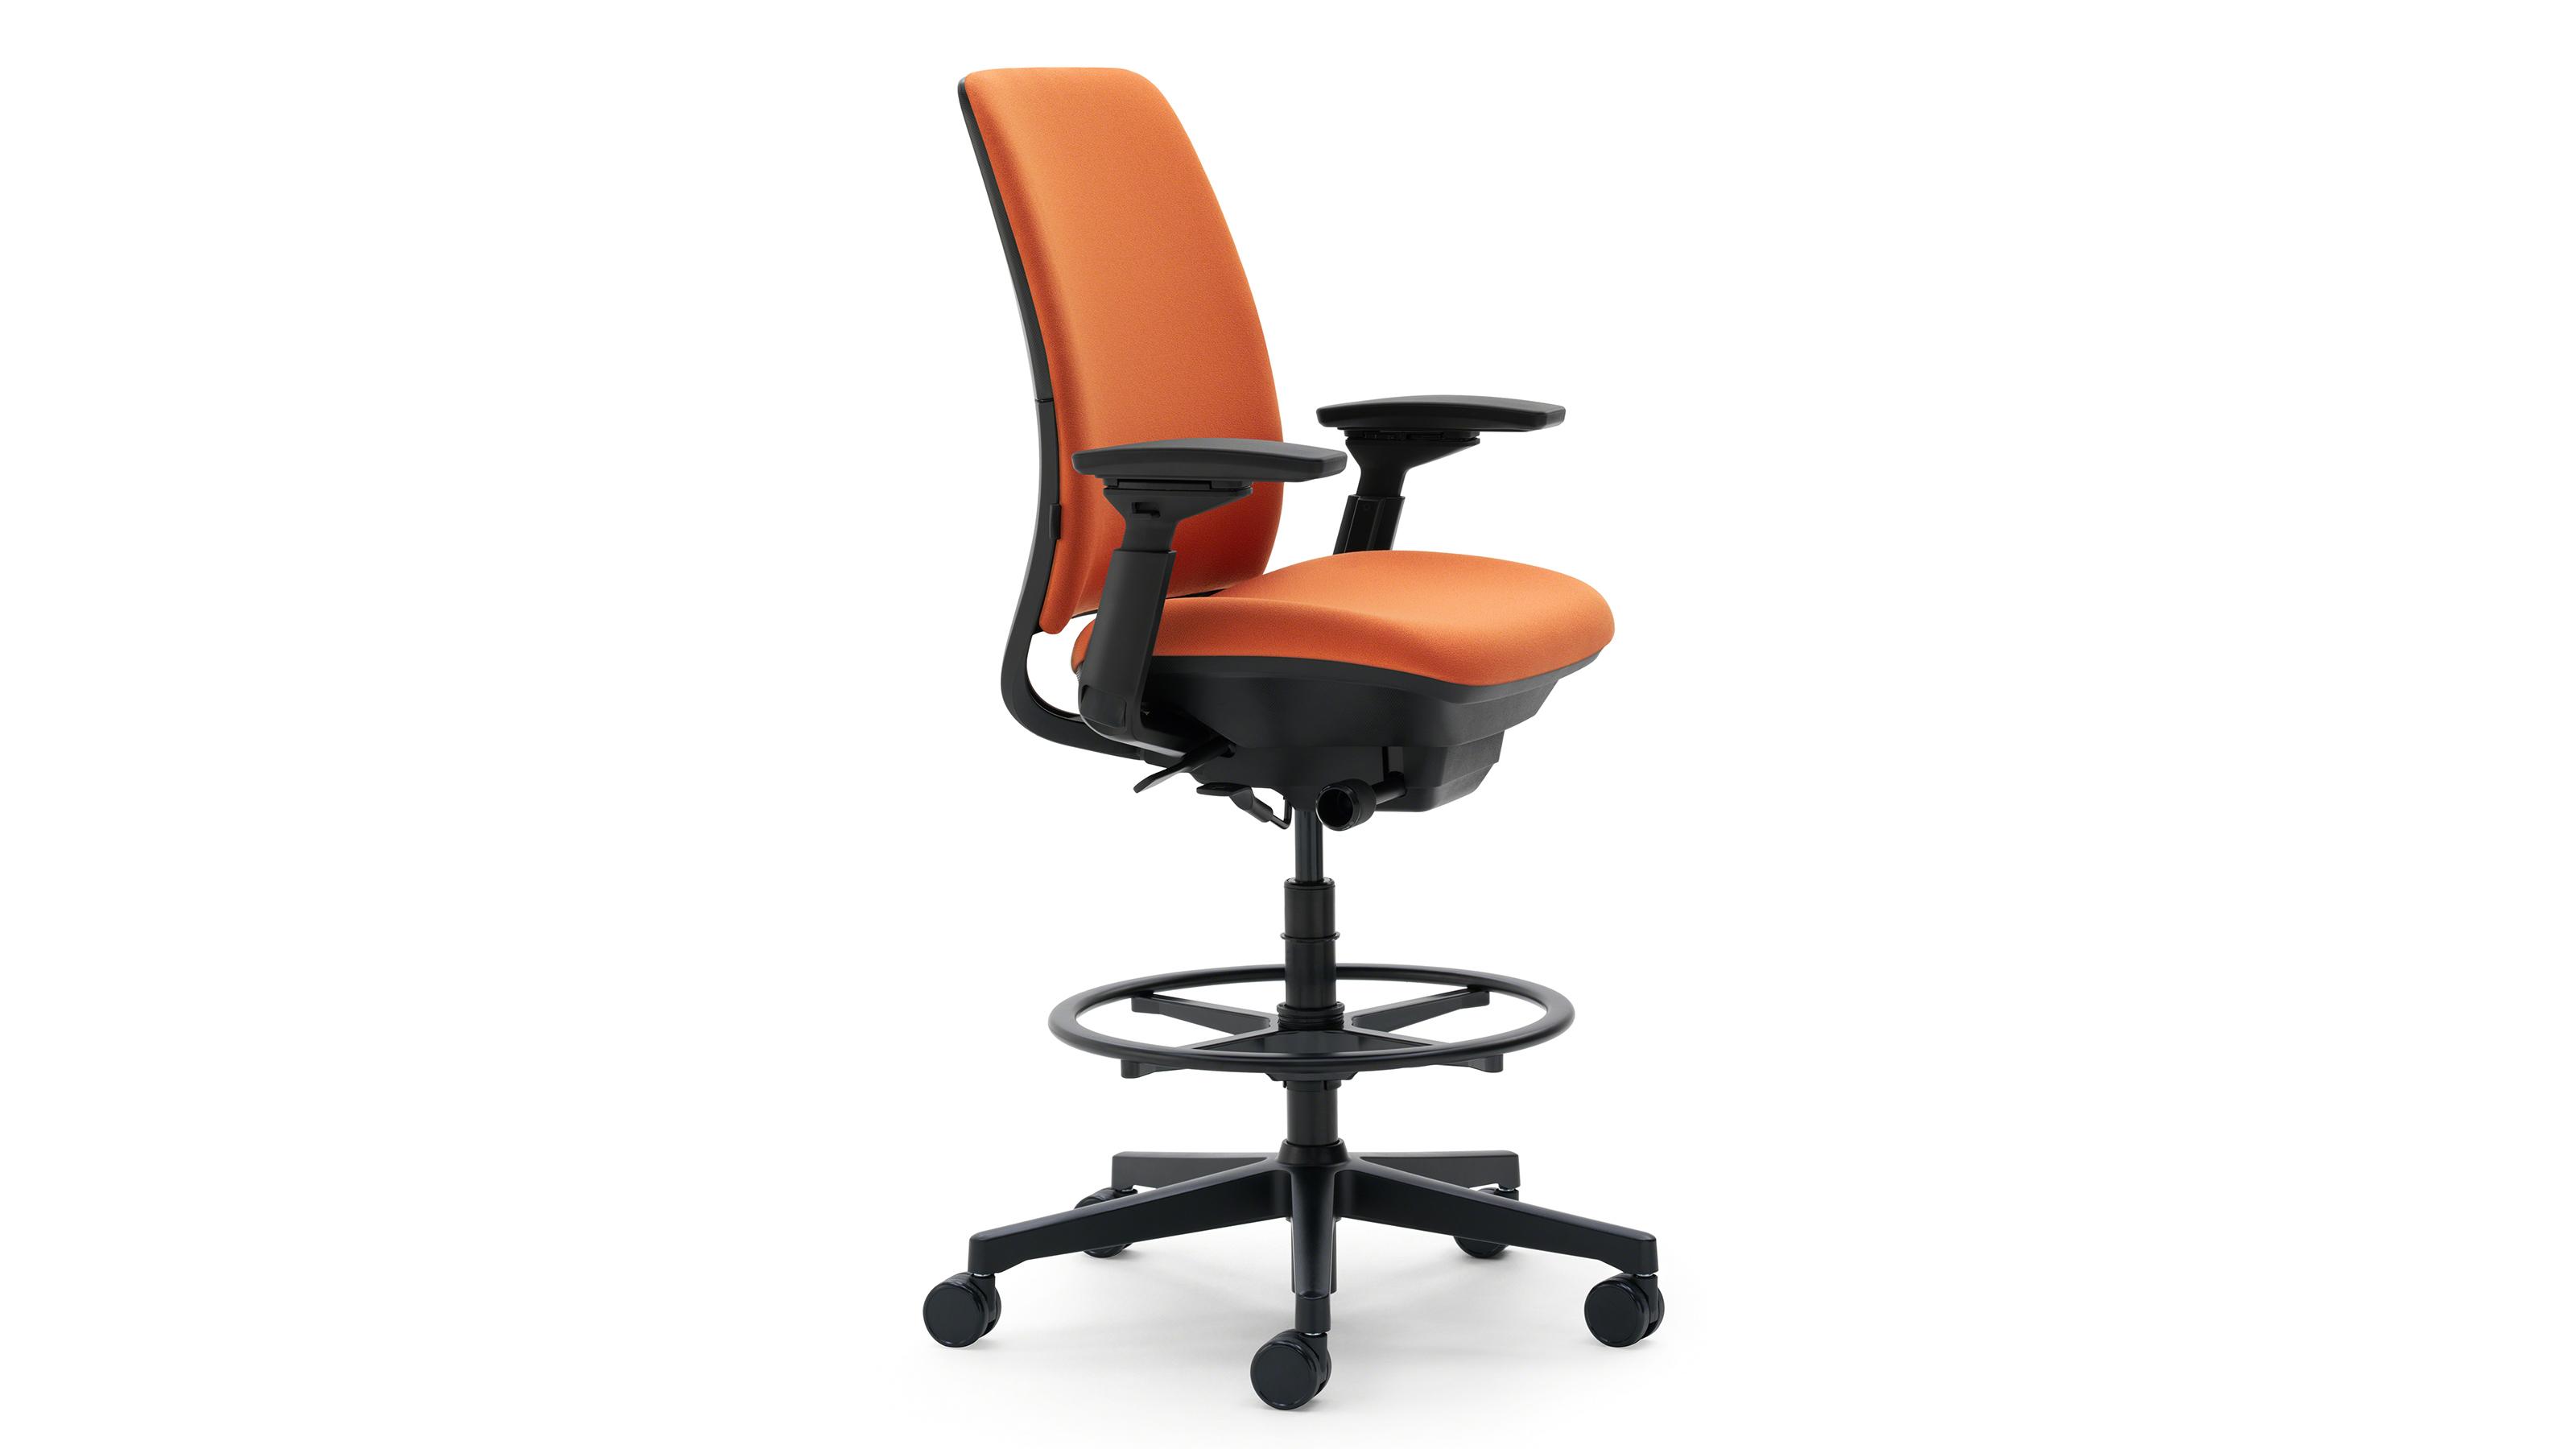 steelcase amia chair recall baby swing uk media